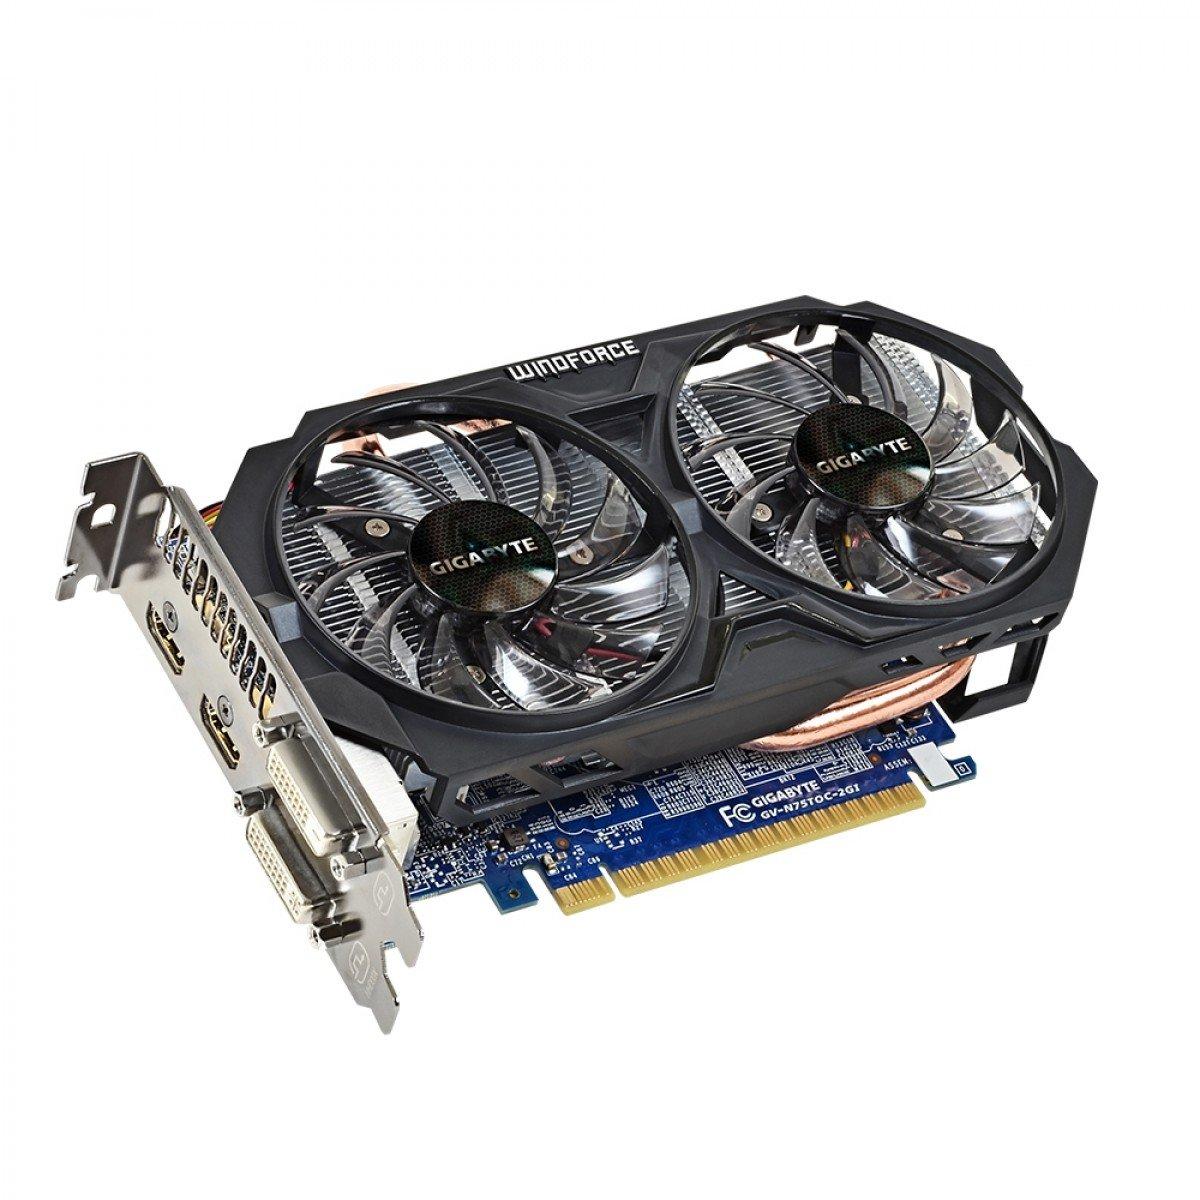 Card GeForce GTX 750 Ti